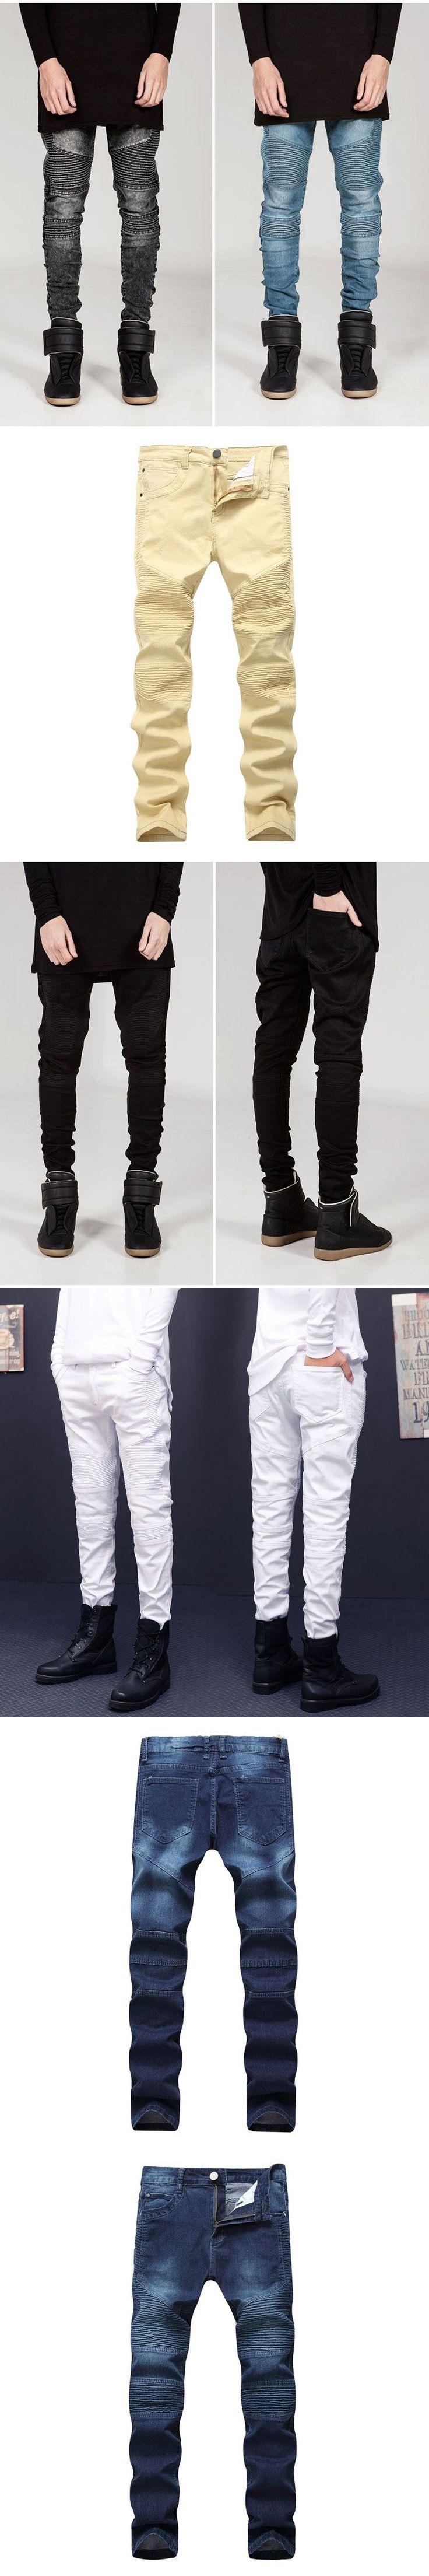 YYFS Men's Jeans Skinny Jeans Men Folded Slim Racer Ripped Biker Jeans Strech Hiphop Jean Homme Pencil Pant Male Pants For Men